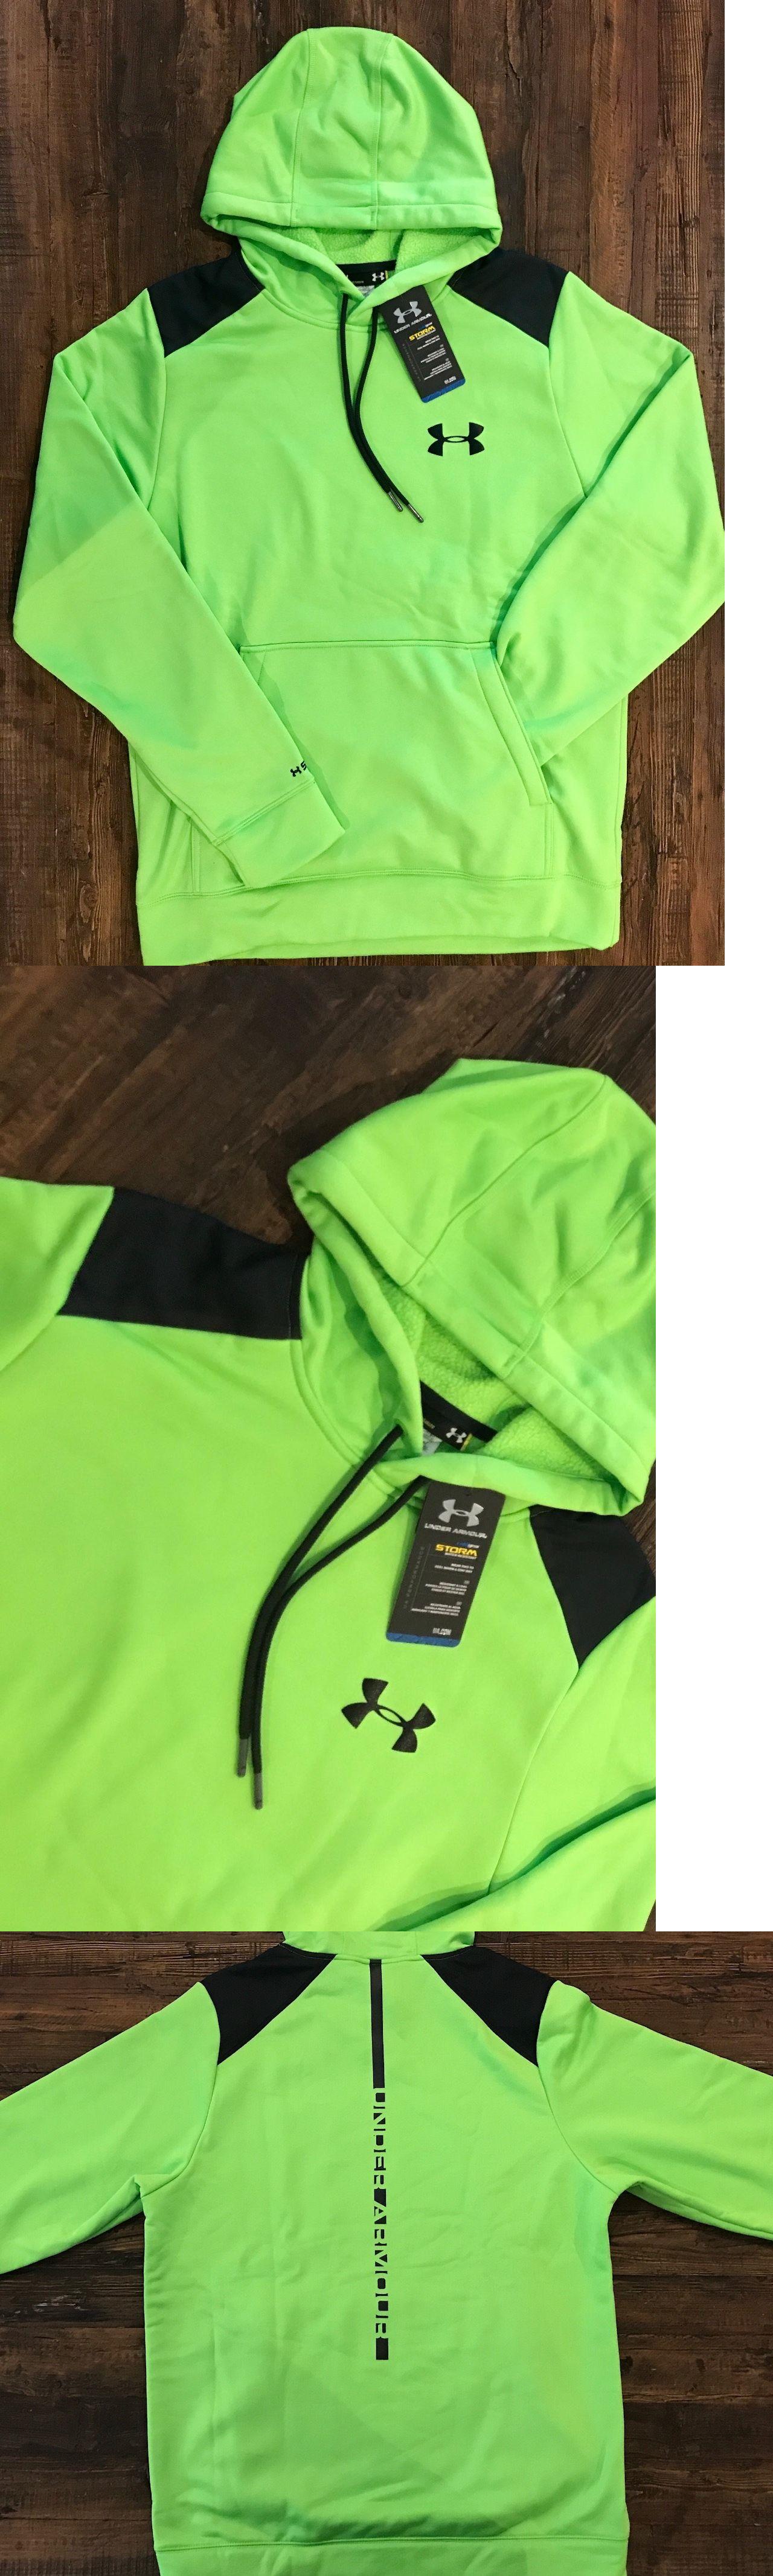 Sweats and Hoodies 155183: Under Armour Men S Ua Storm Armour Fleece Marauder Hoodie 1248325 Gecko Green -> BUY IT NOW ONLY: $34.98 on eBay!